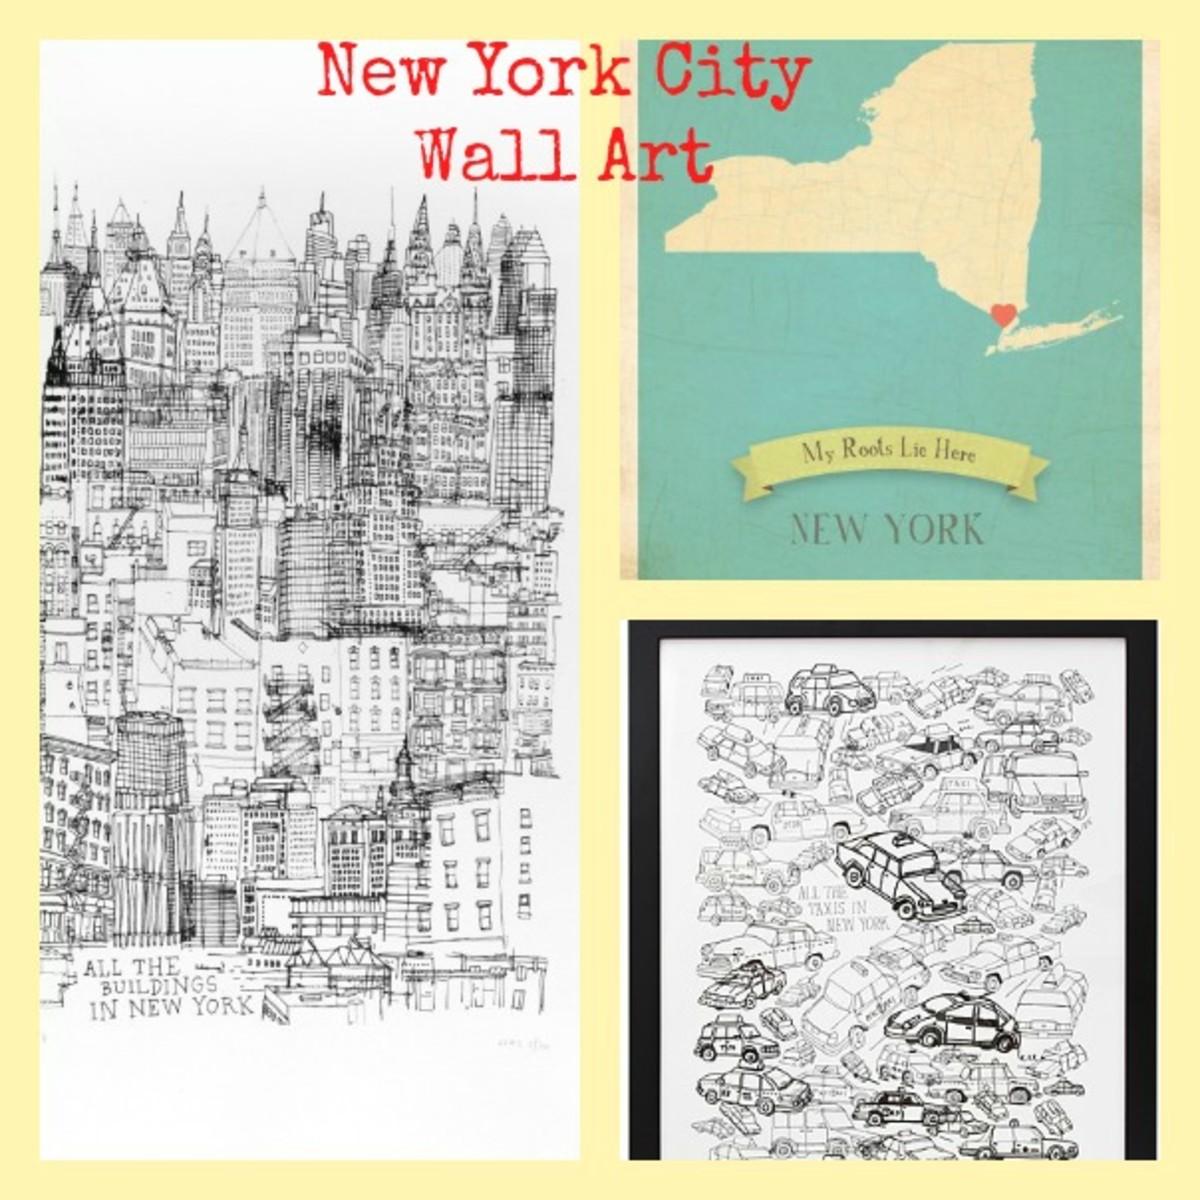 NYC-art